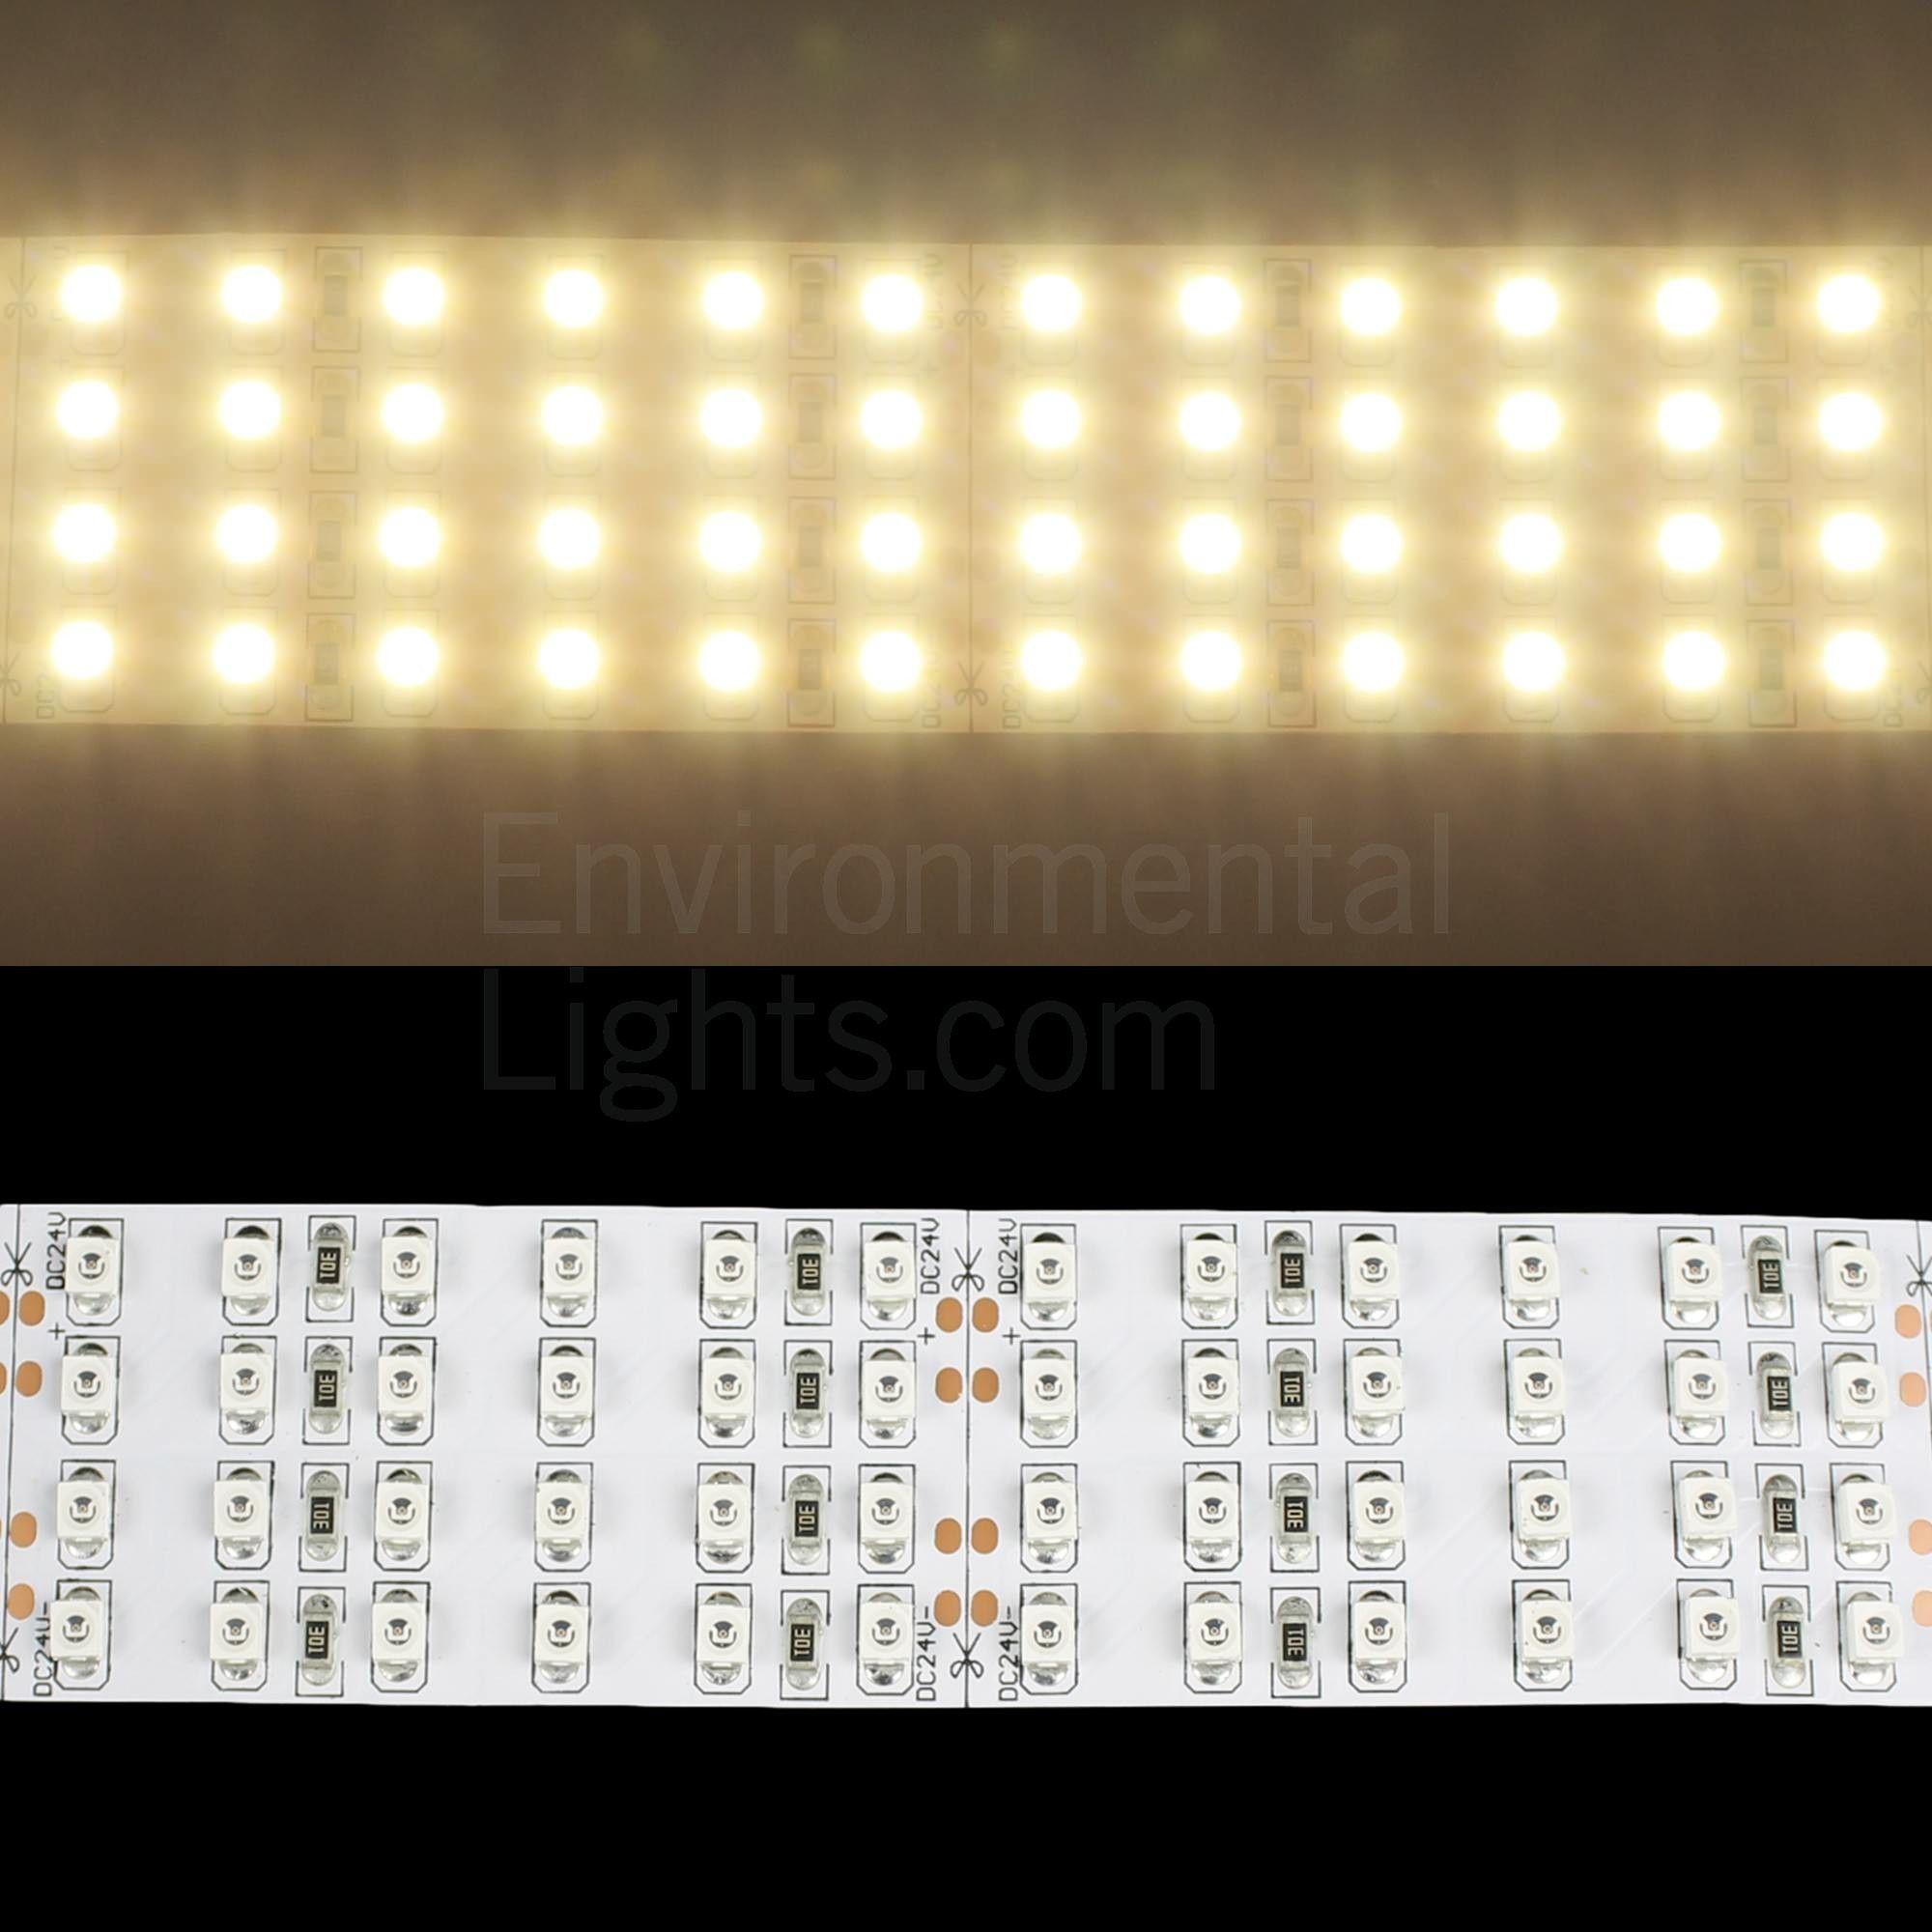 Ww 3528 Quad Row Led Strip Light 450 M 28mm Wide 3 2m Reel 24 Volts Dc 100 Watts 9 5 Watts Foot 31 3 Watts Met Strip Lighting Led Strip Lighting Led Strip